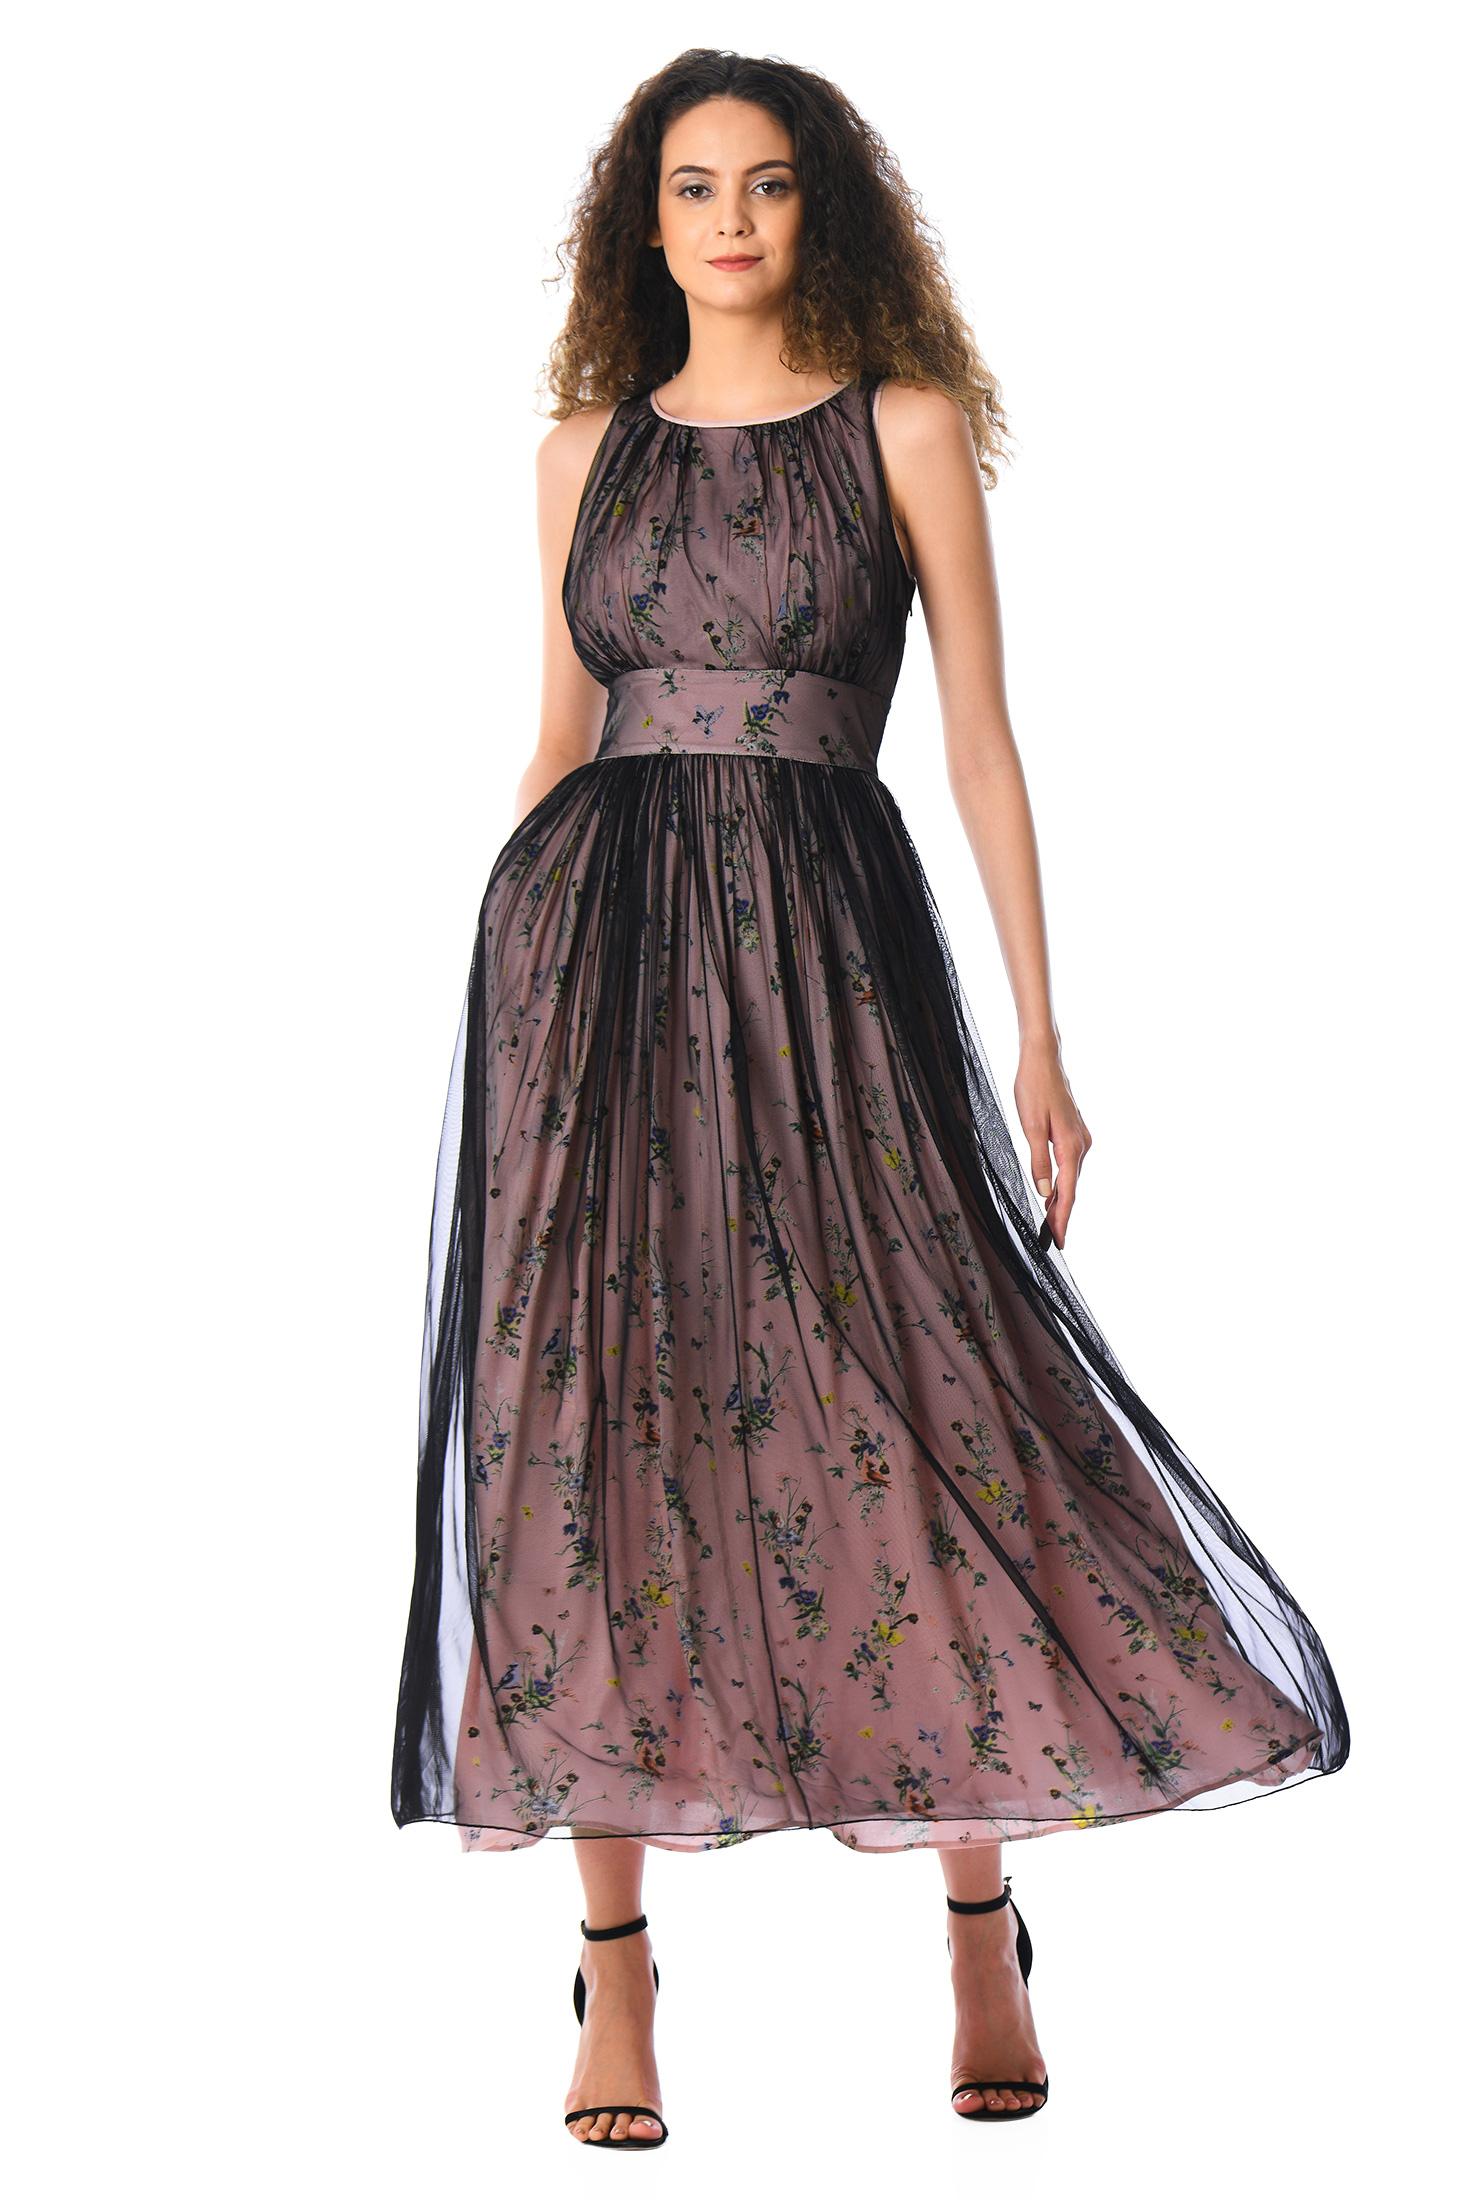 1d6b771f13c Women s Fashion Clothing 0-36W and Custom